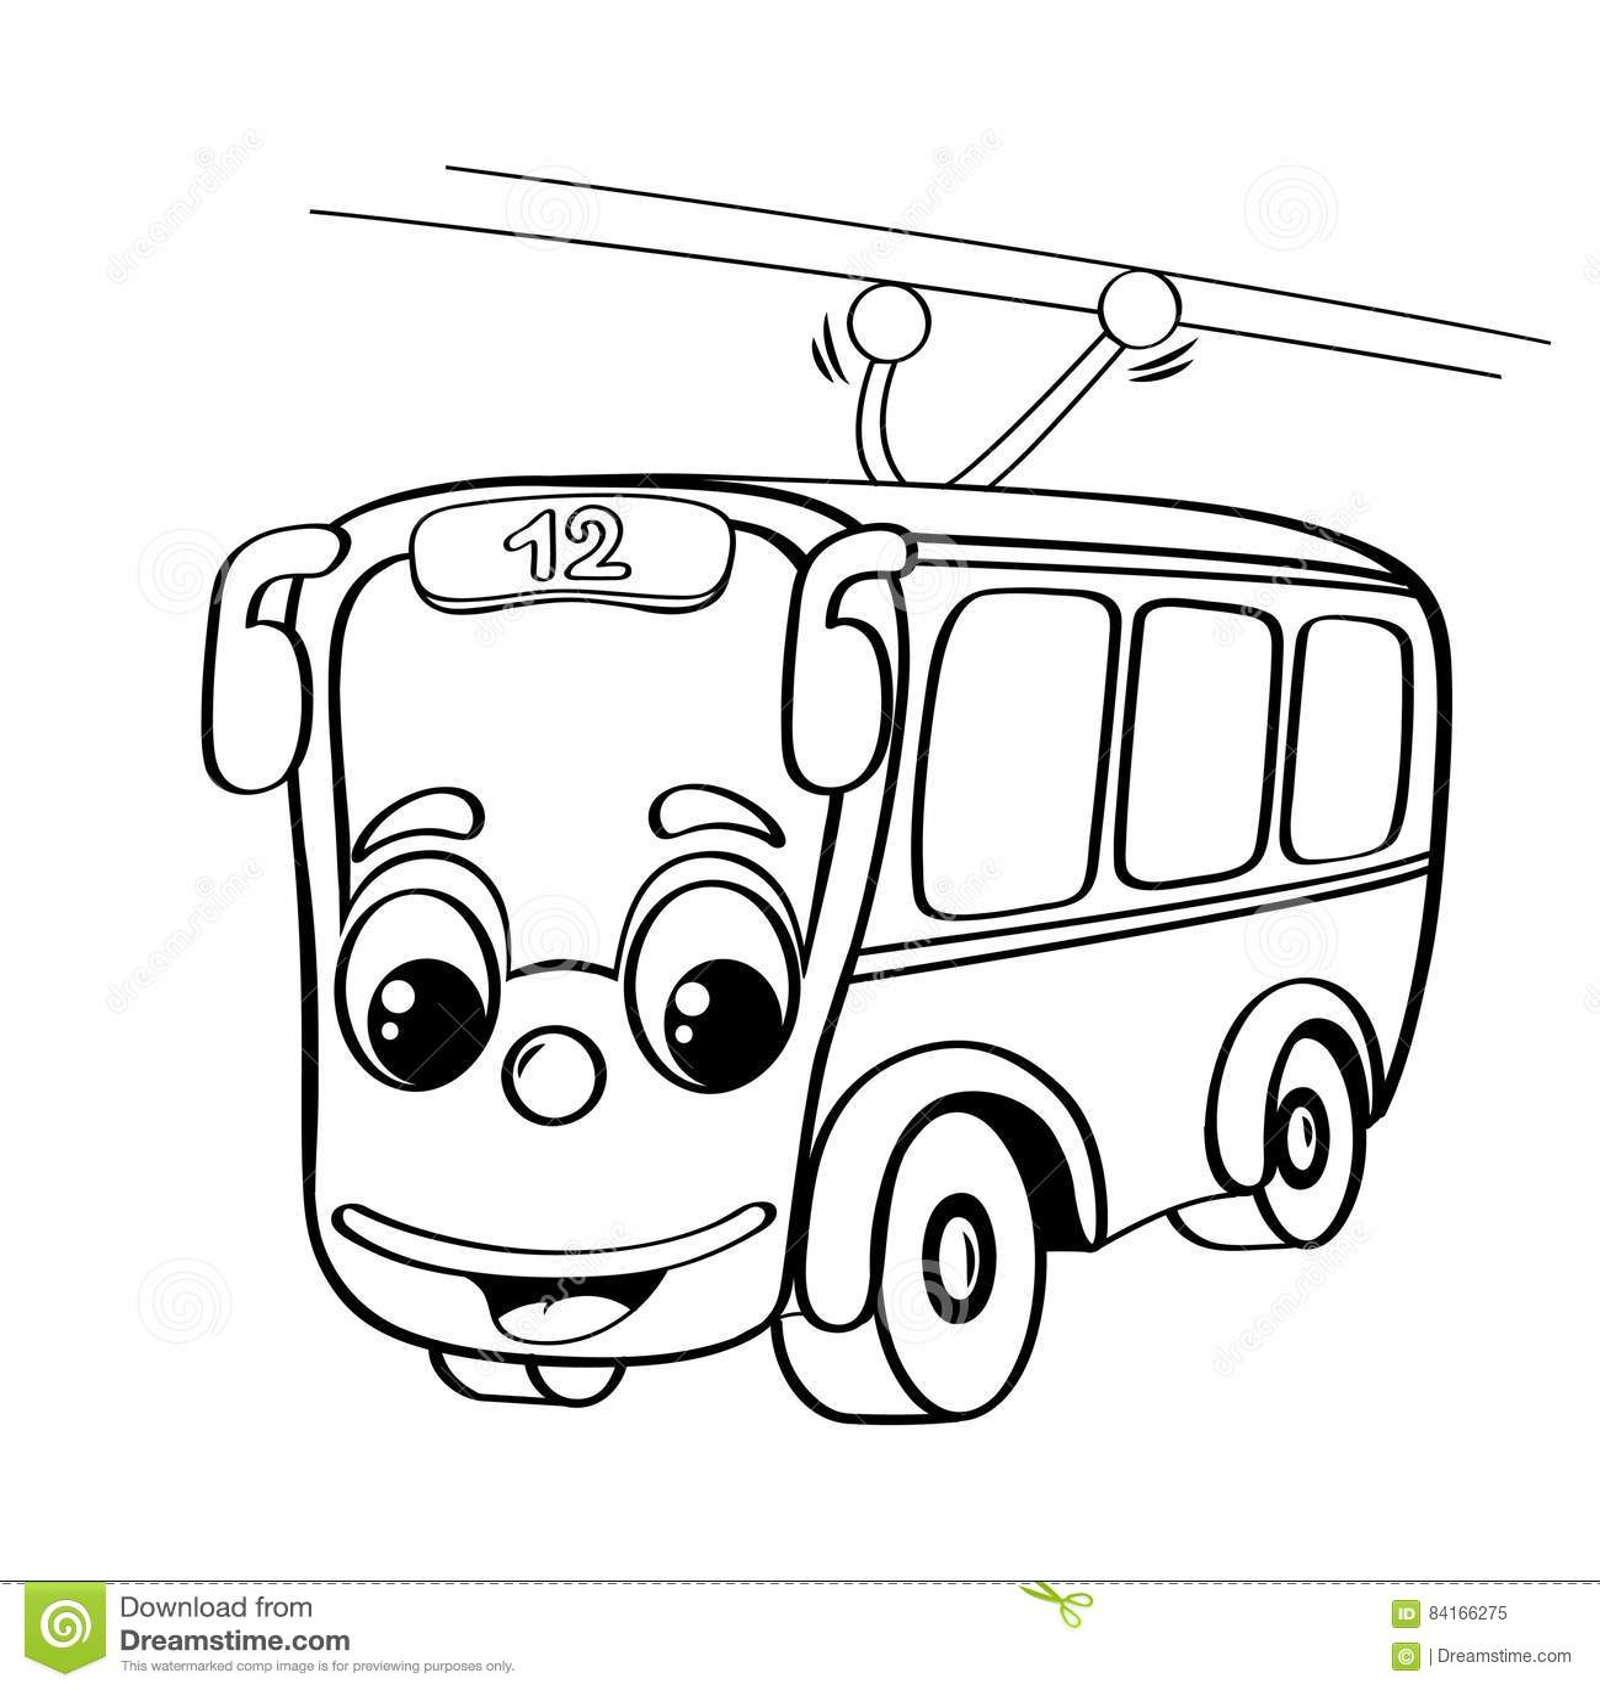 Onibus Bonde Engracado Dos Desenhos Animados Ilustracao Do Vetor